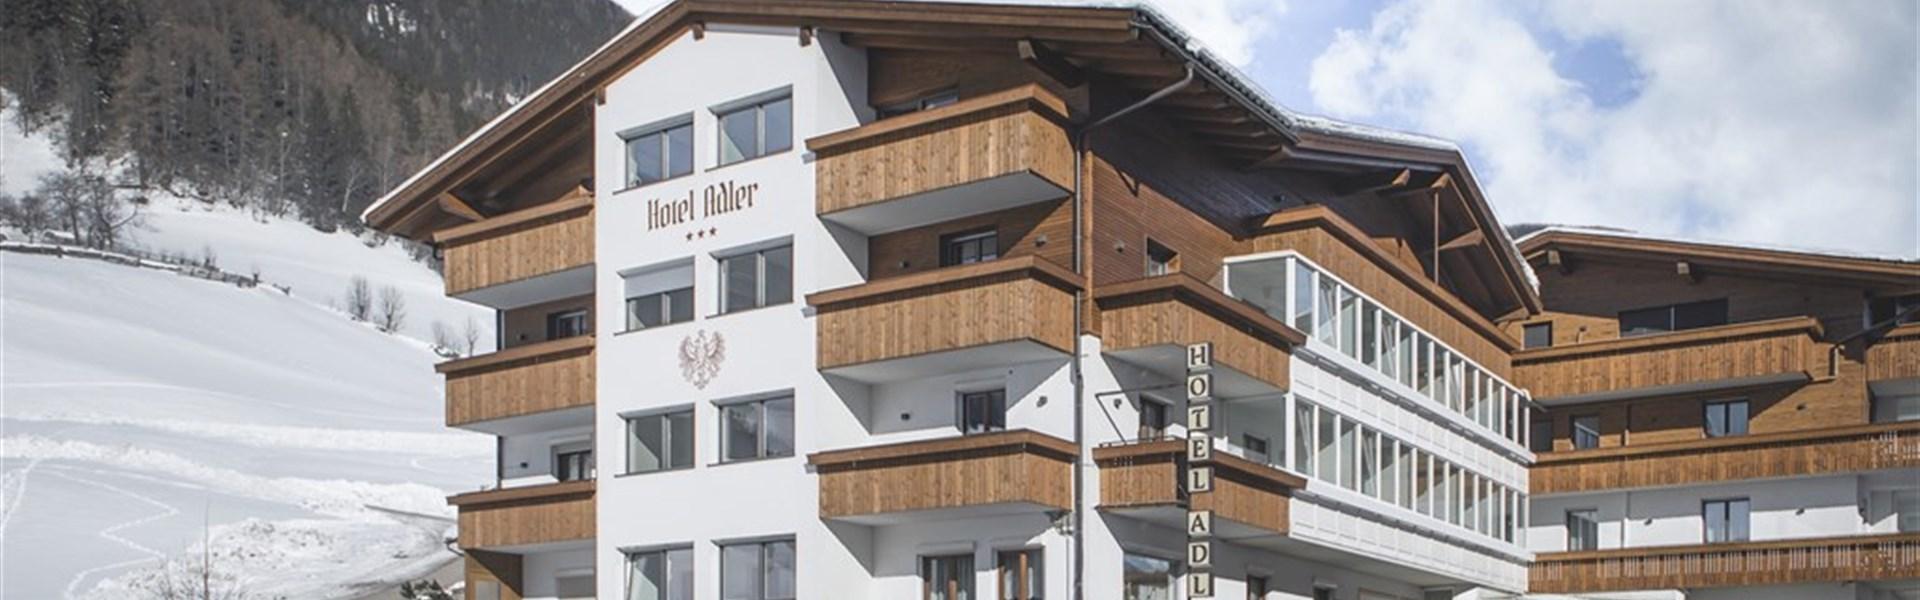 Marco Polo - Hotel Adler -